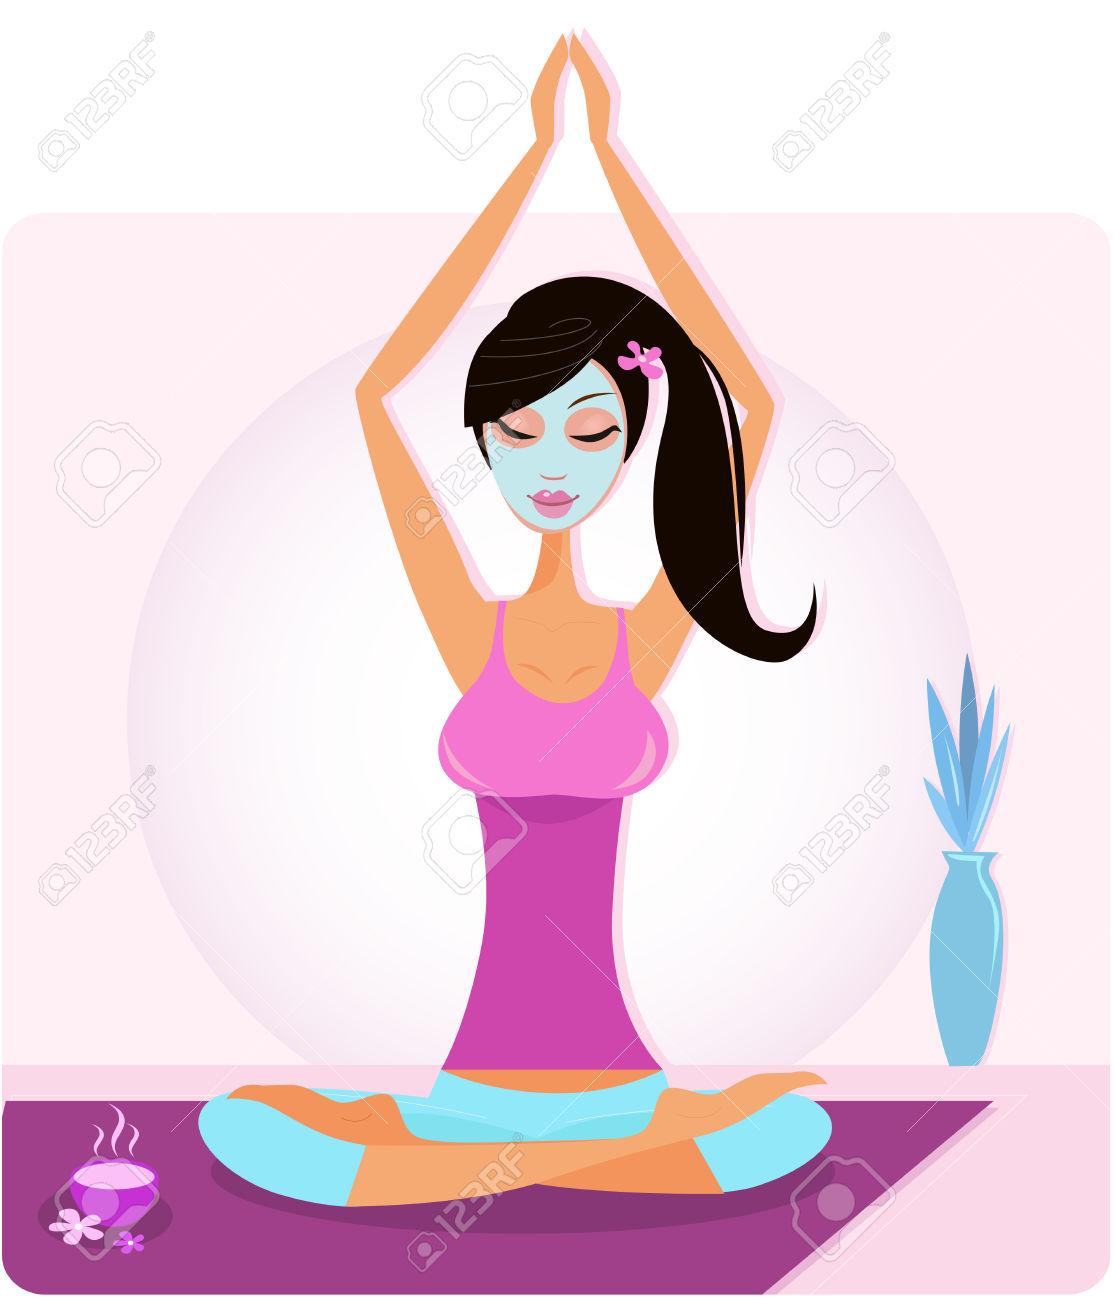 1115x1300 Meditation Clipart Yoga Asana3705177